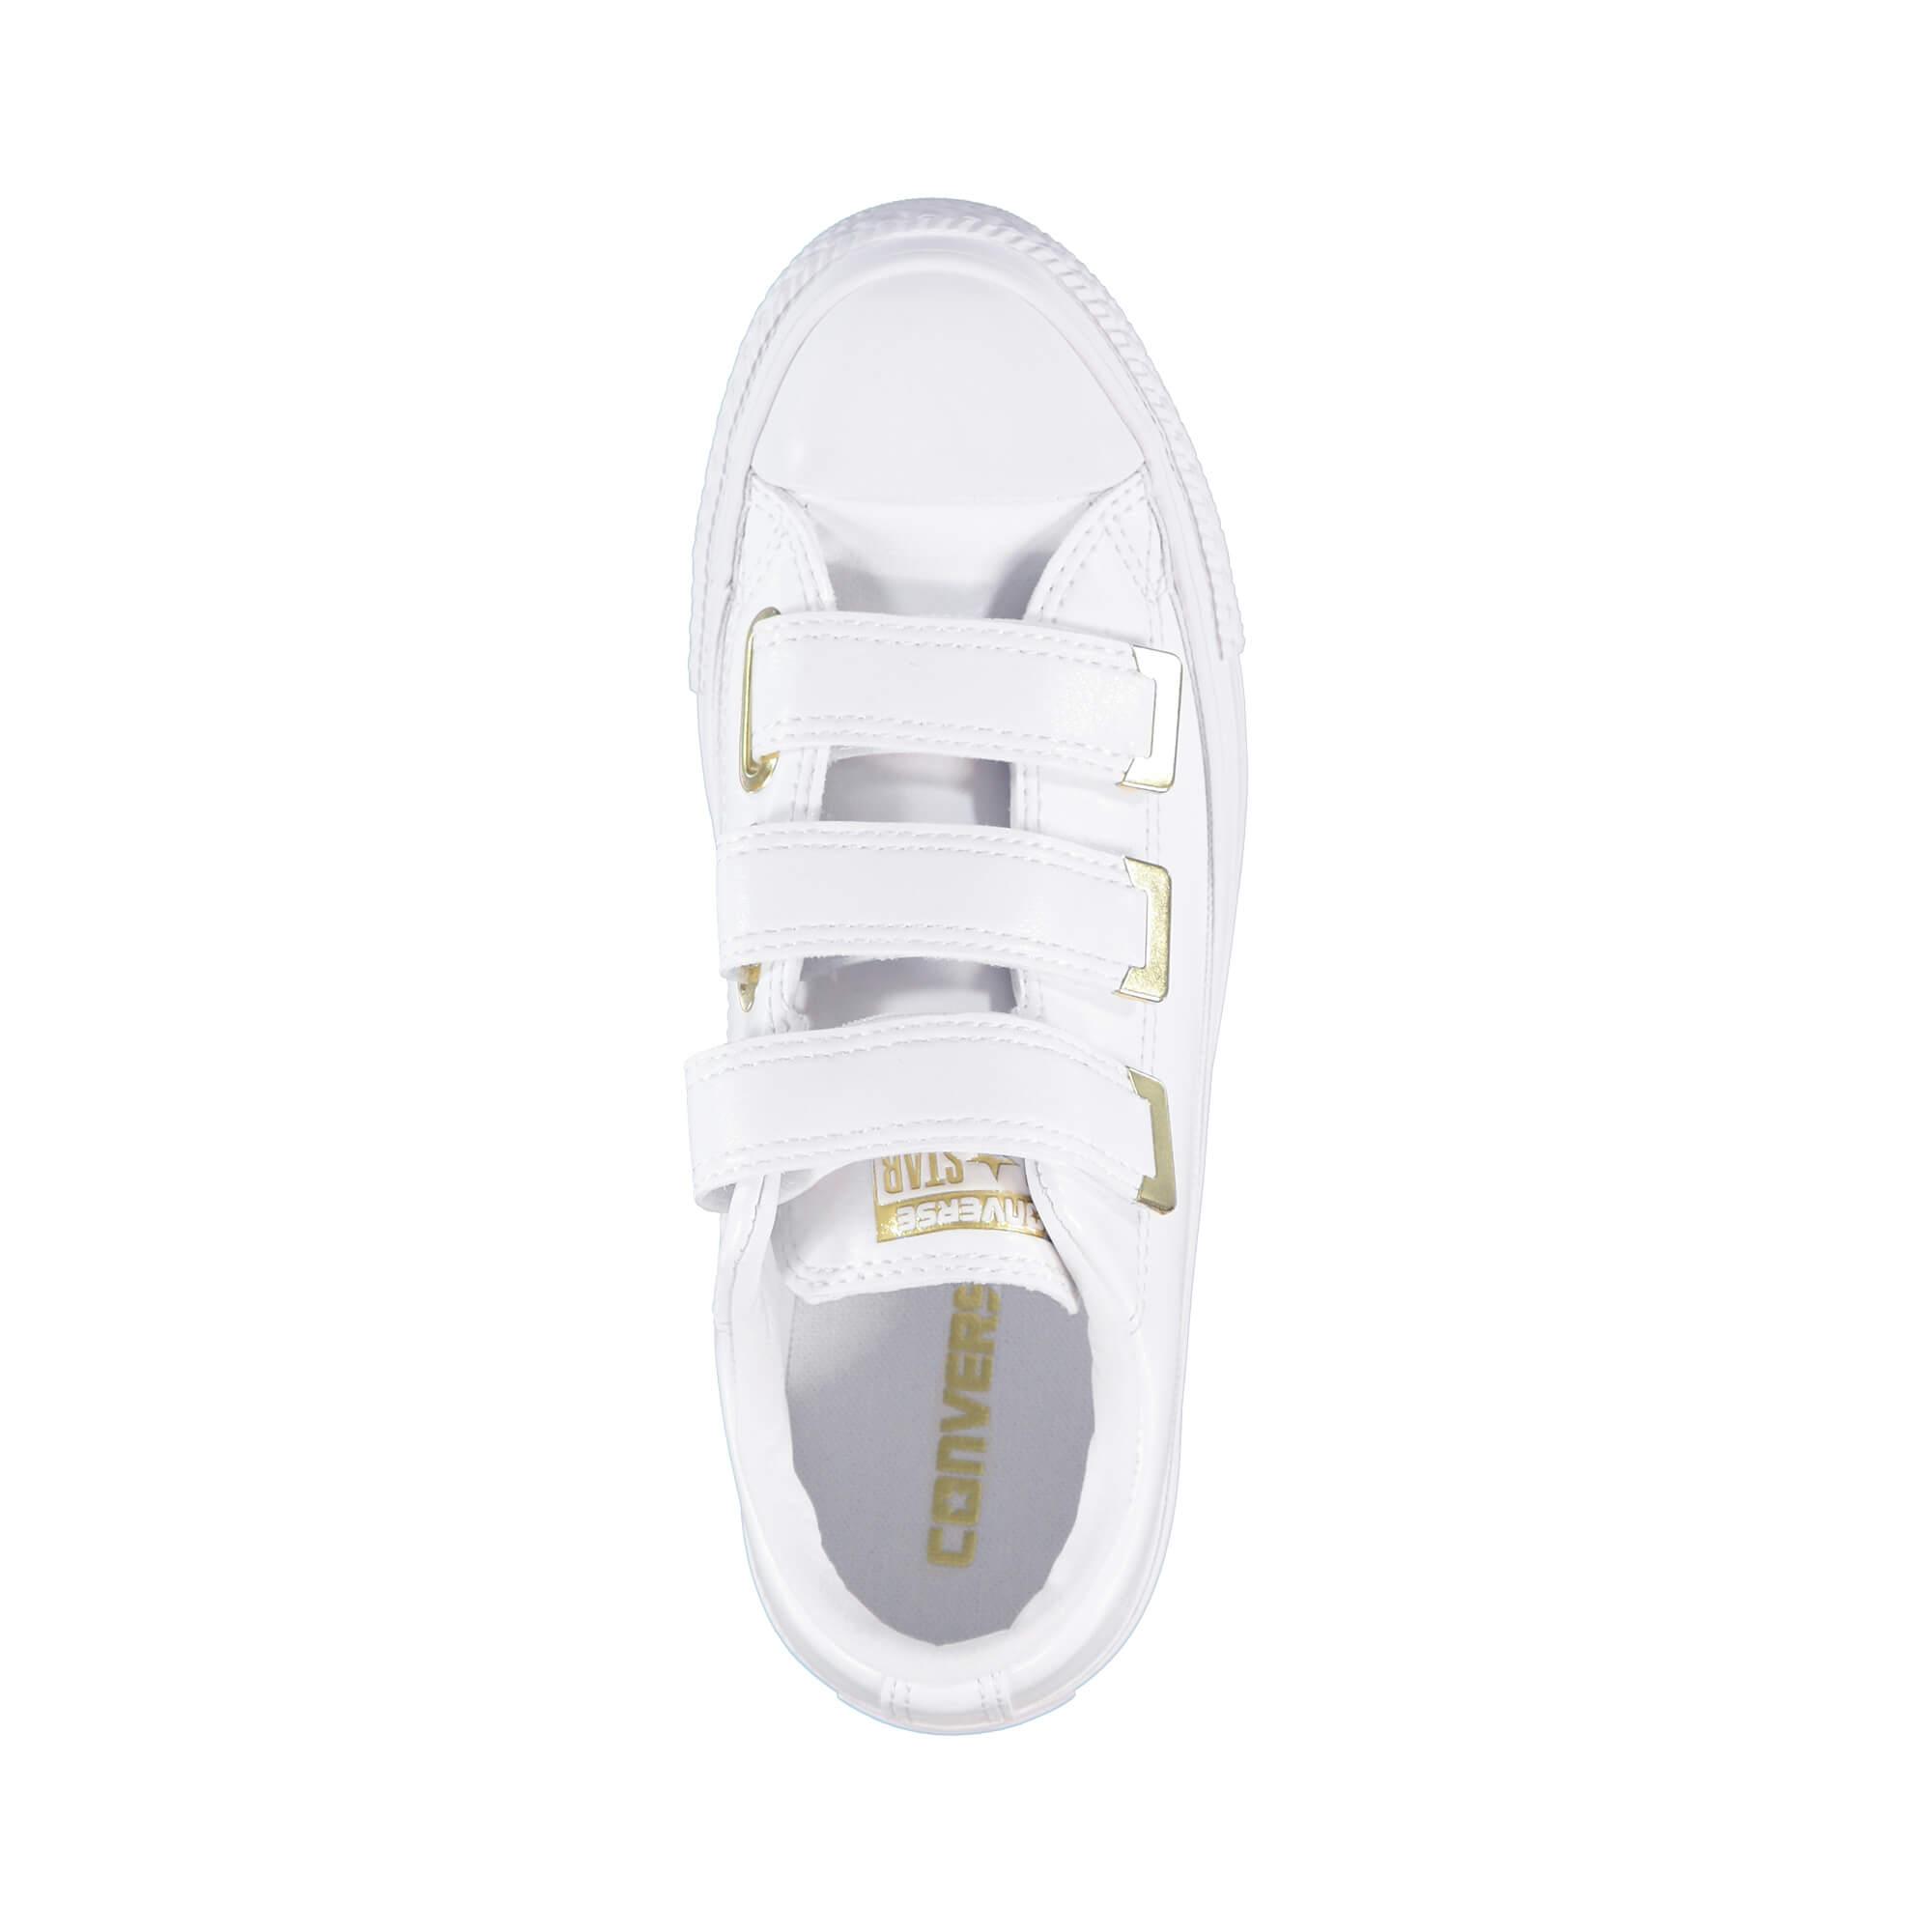 Converse Chuck Taylor All Star 3V Kadın Beyaz Sneaker